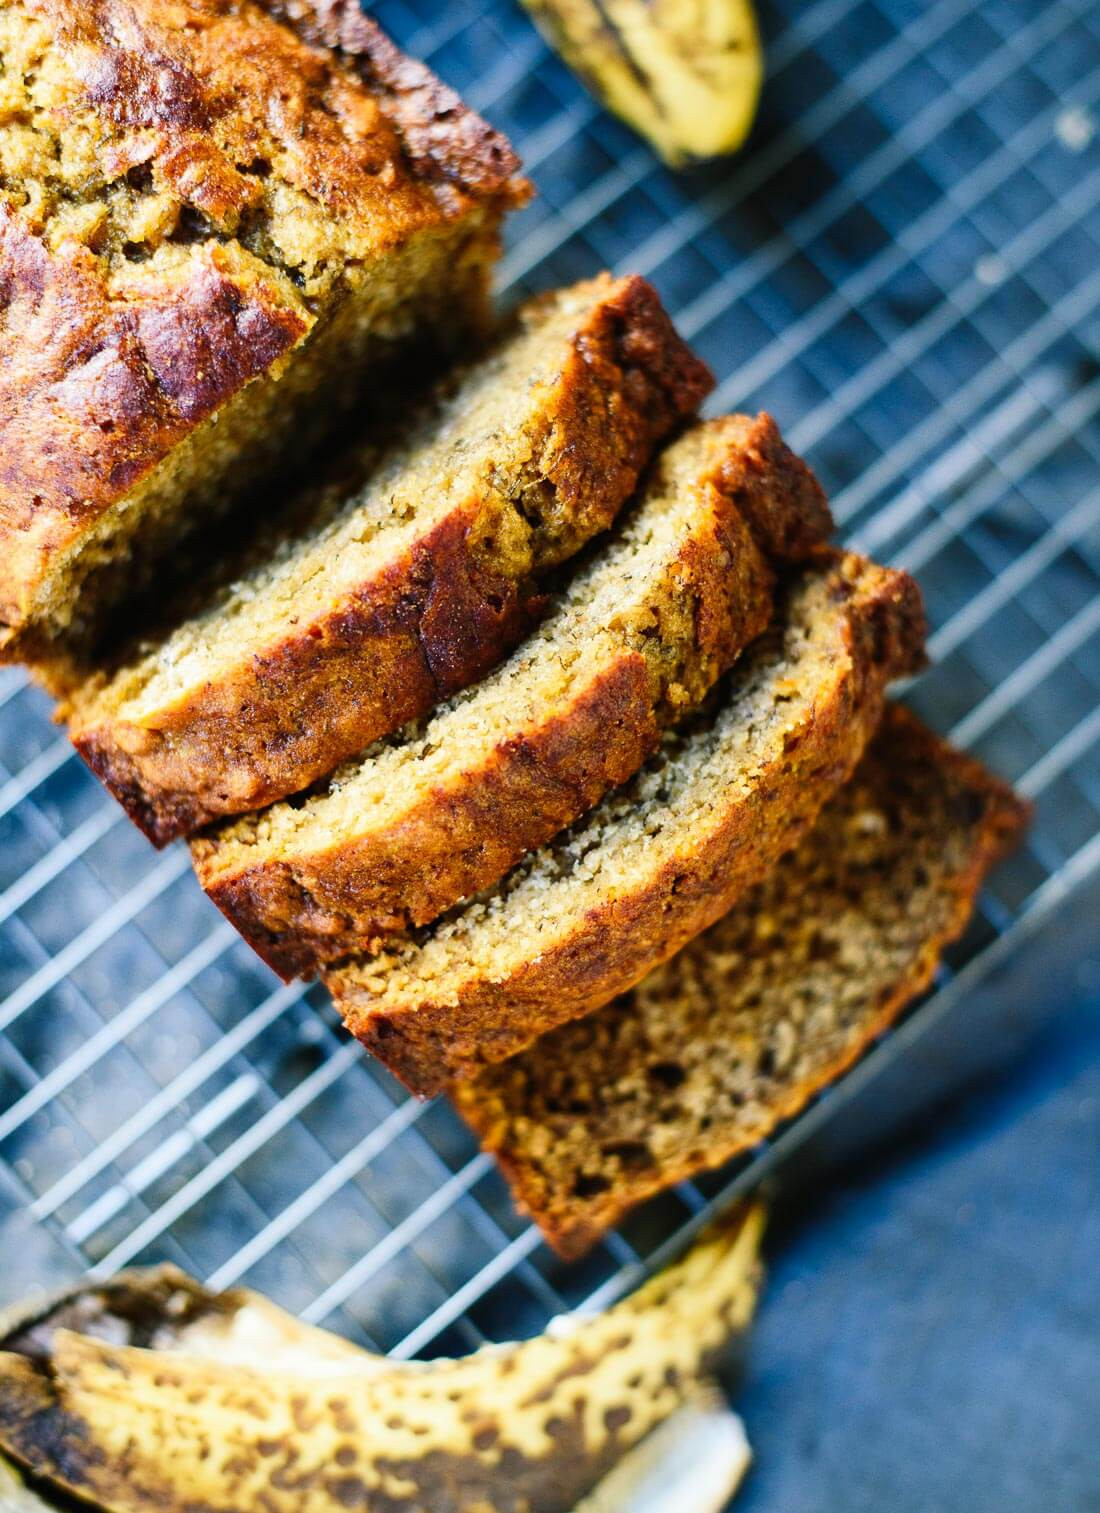 Banana Bread Healthy Recipe  Healthy Banana Bread Recipe Cookie and Kate